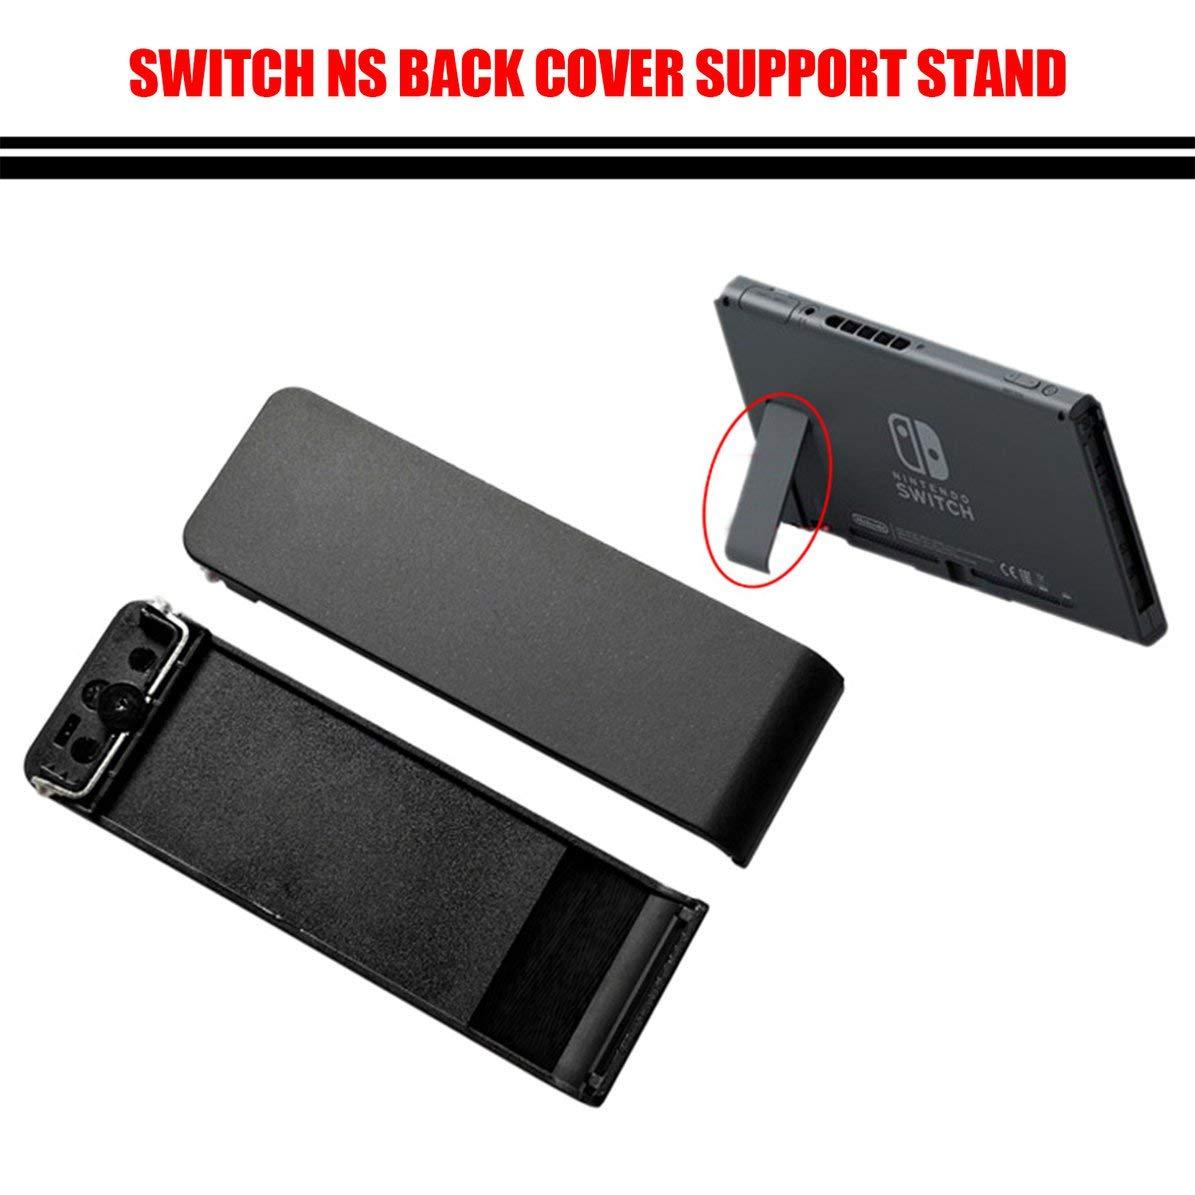 Reparaci/ón Reemplazo Parte Host Back Shell Kickstand Bracket Kit para Nintend Switch Game Console NS negro WEIWEITOE